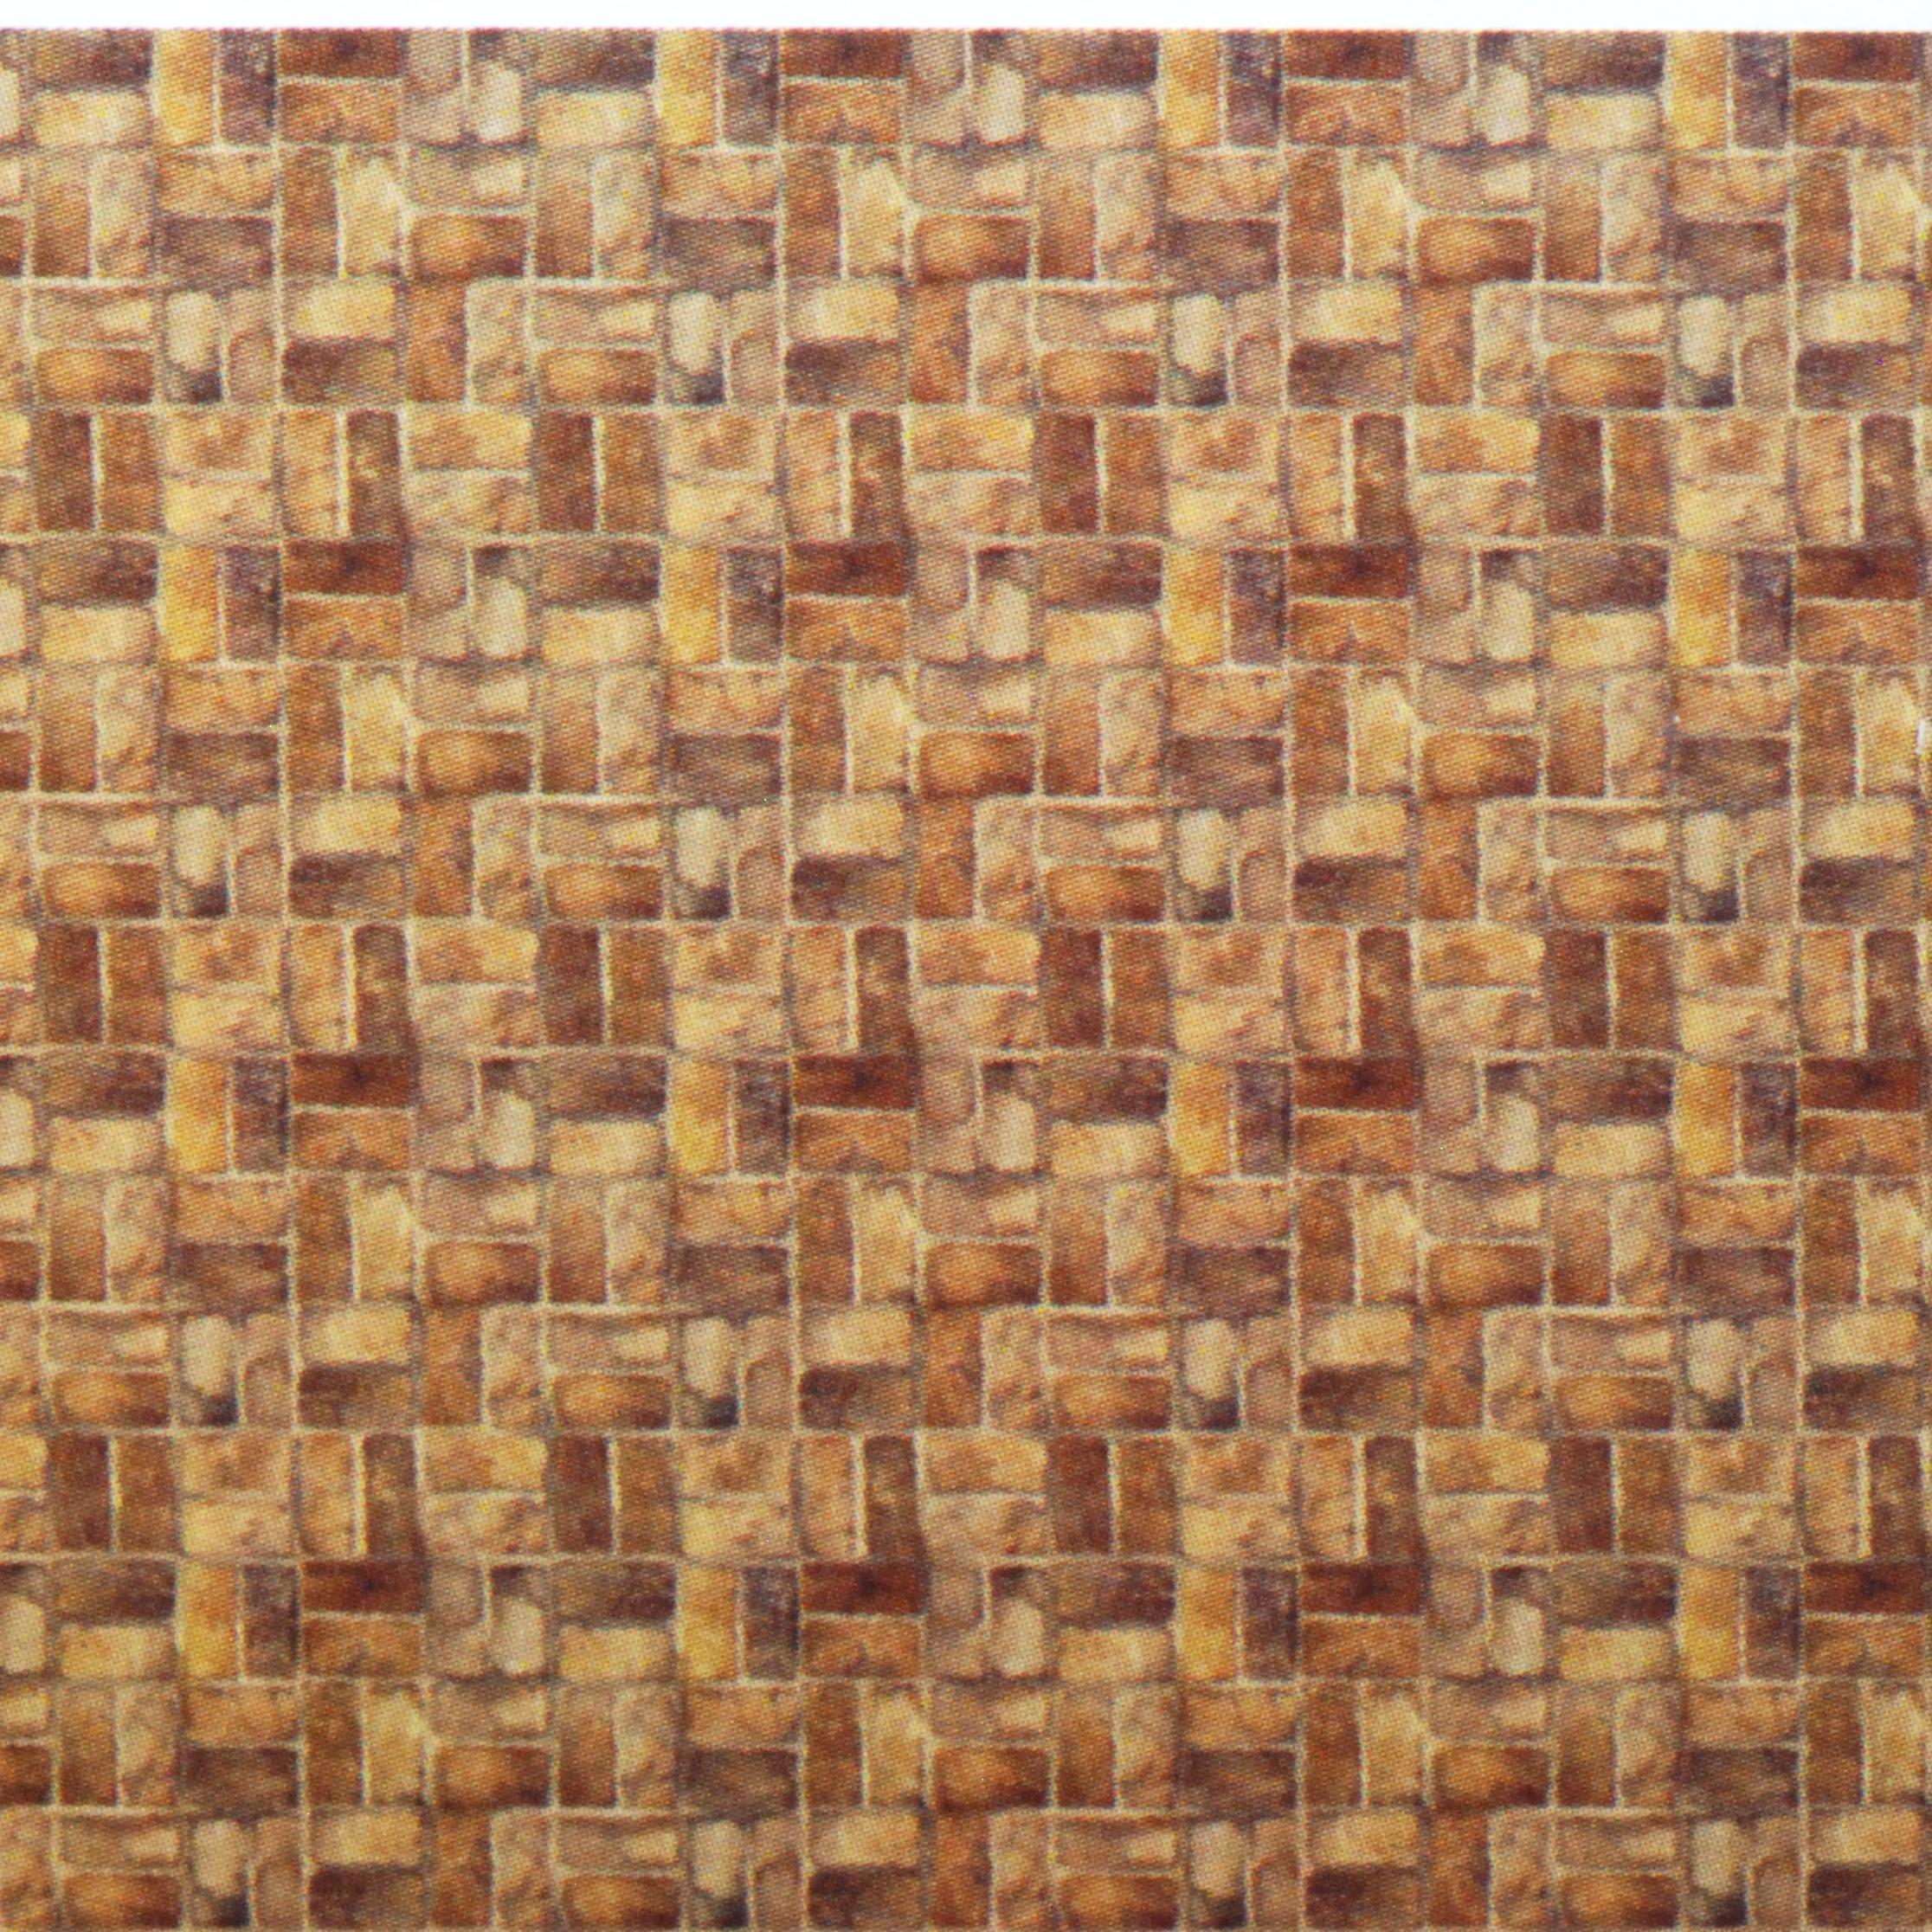 148 Wallpaper Parquet Flooring Stewart Dollhouse